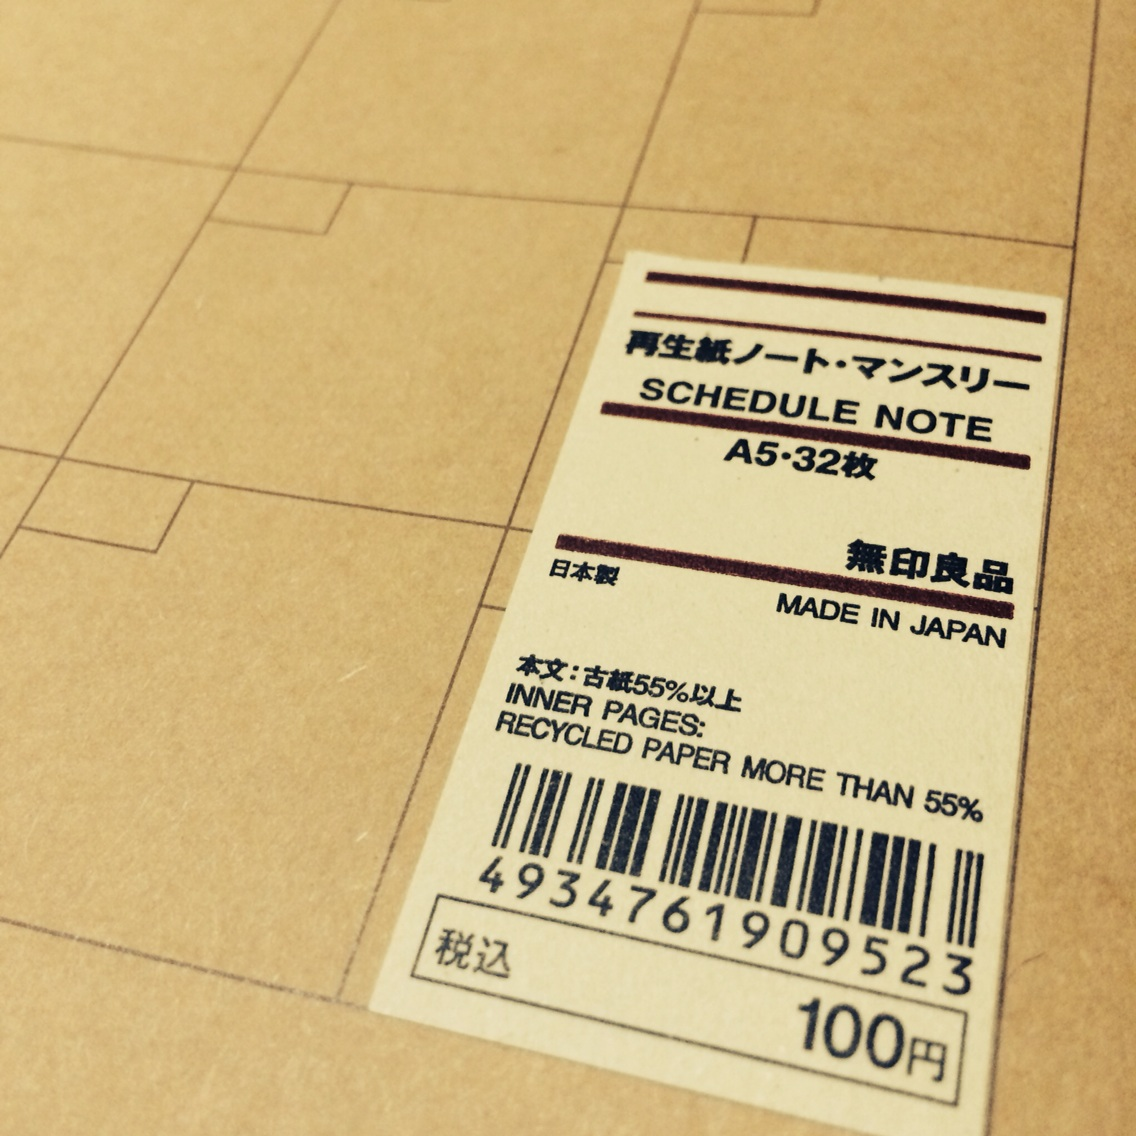 Evernote Camera Roll 20140702 231746.jpg